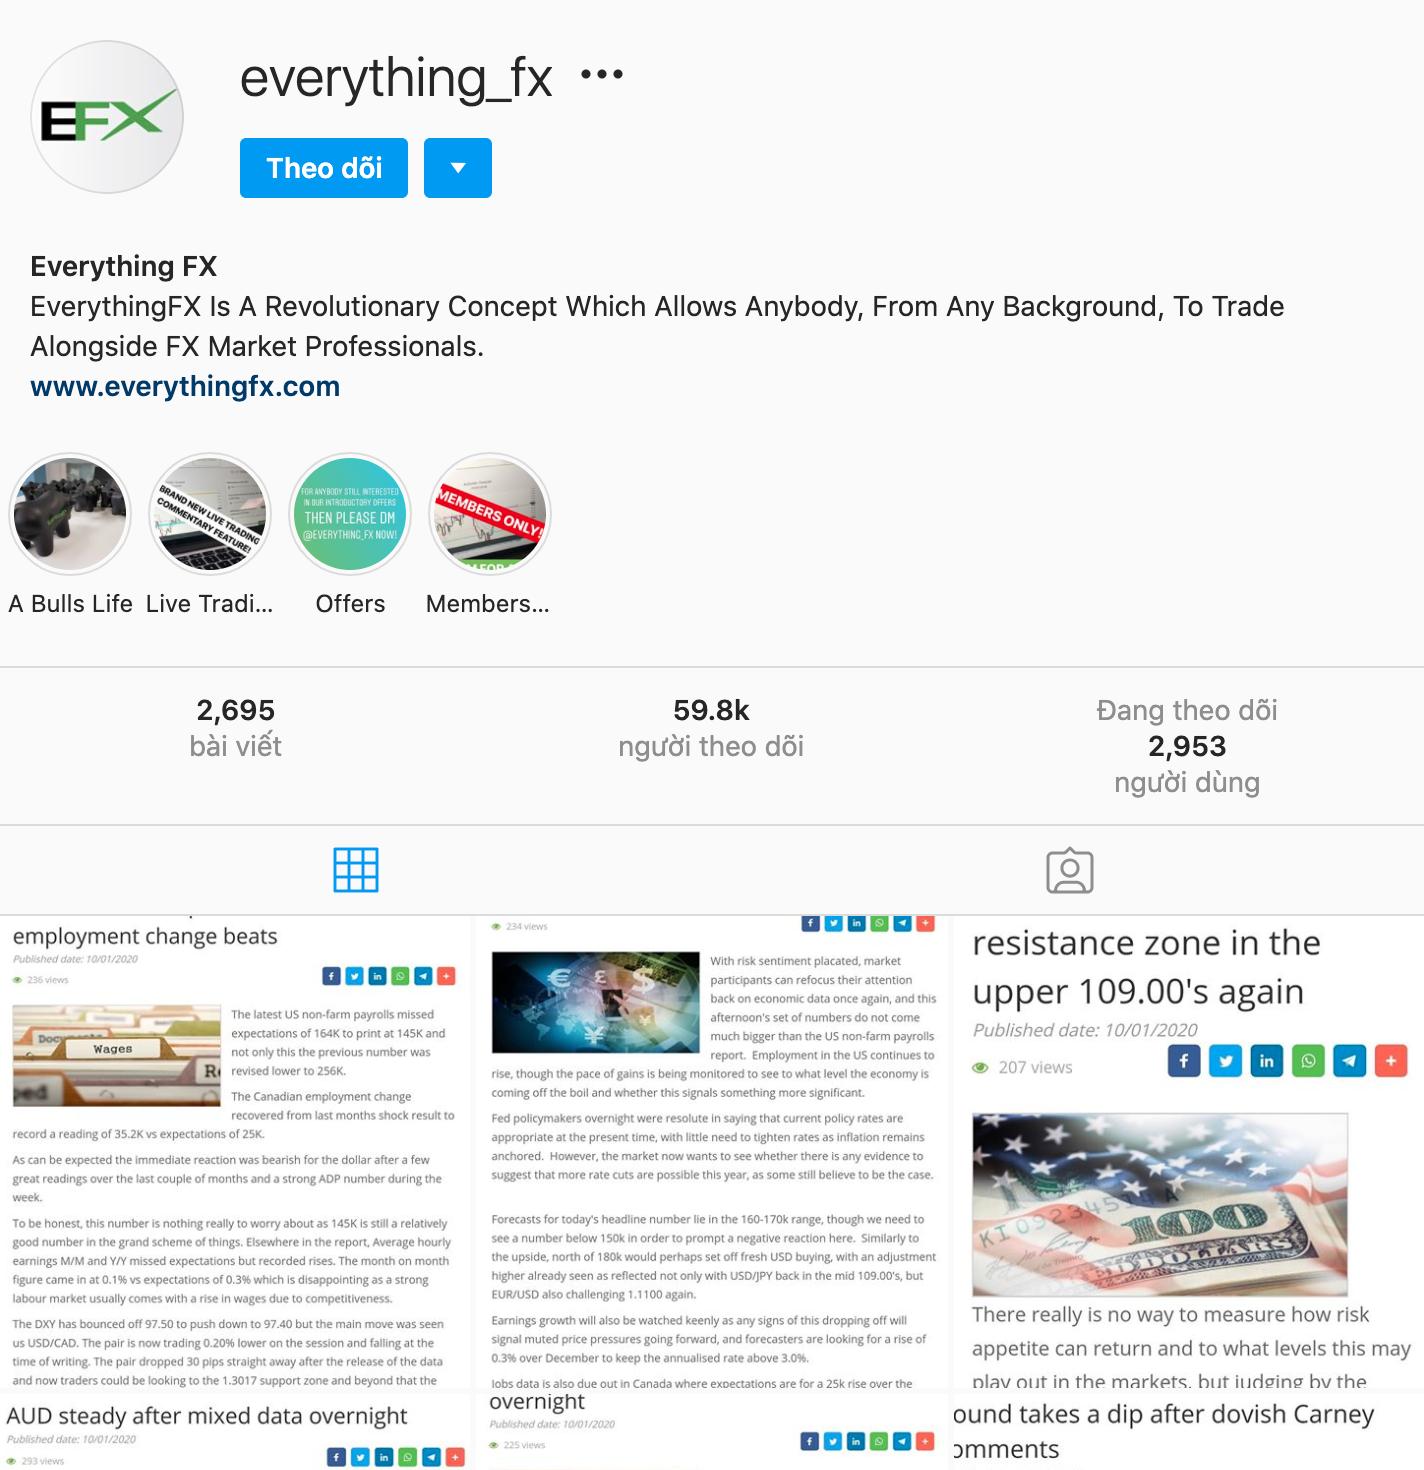 Tai-khoan-Instagram-cua-Forex-trader-dang-theo-doi-nhat-TraderViet12.